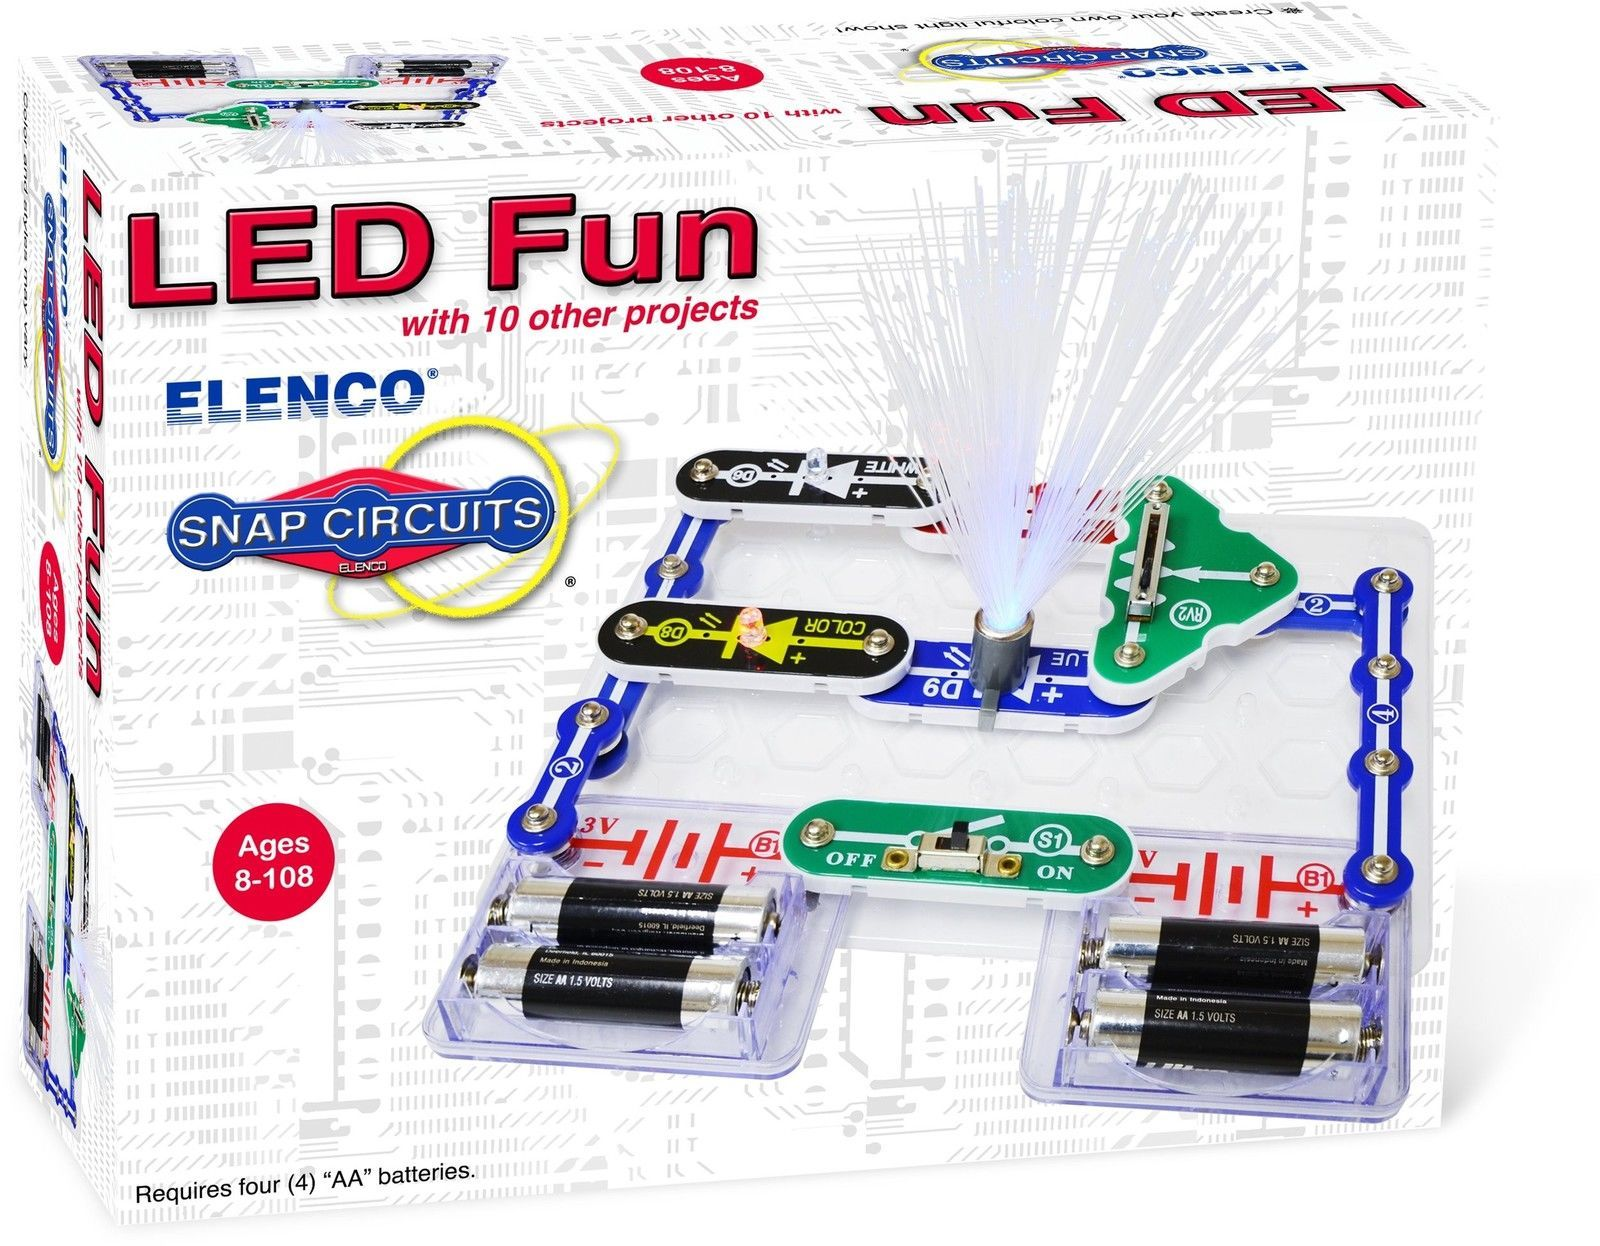 Transformer Elenco Electronics Scp 11 Snap Circuits Led Fun Science Electronic Circuit Kit